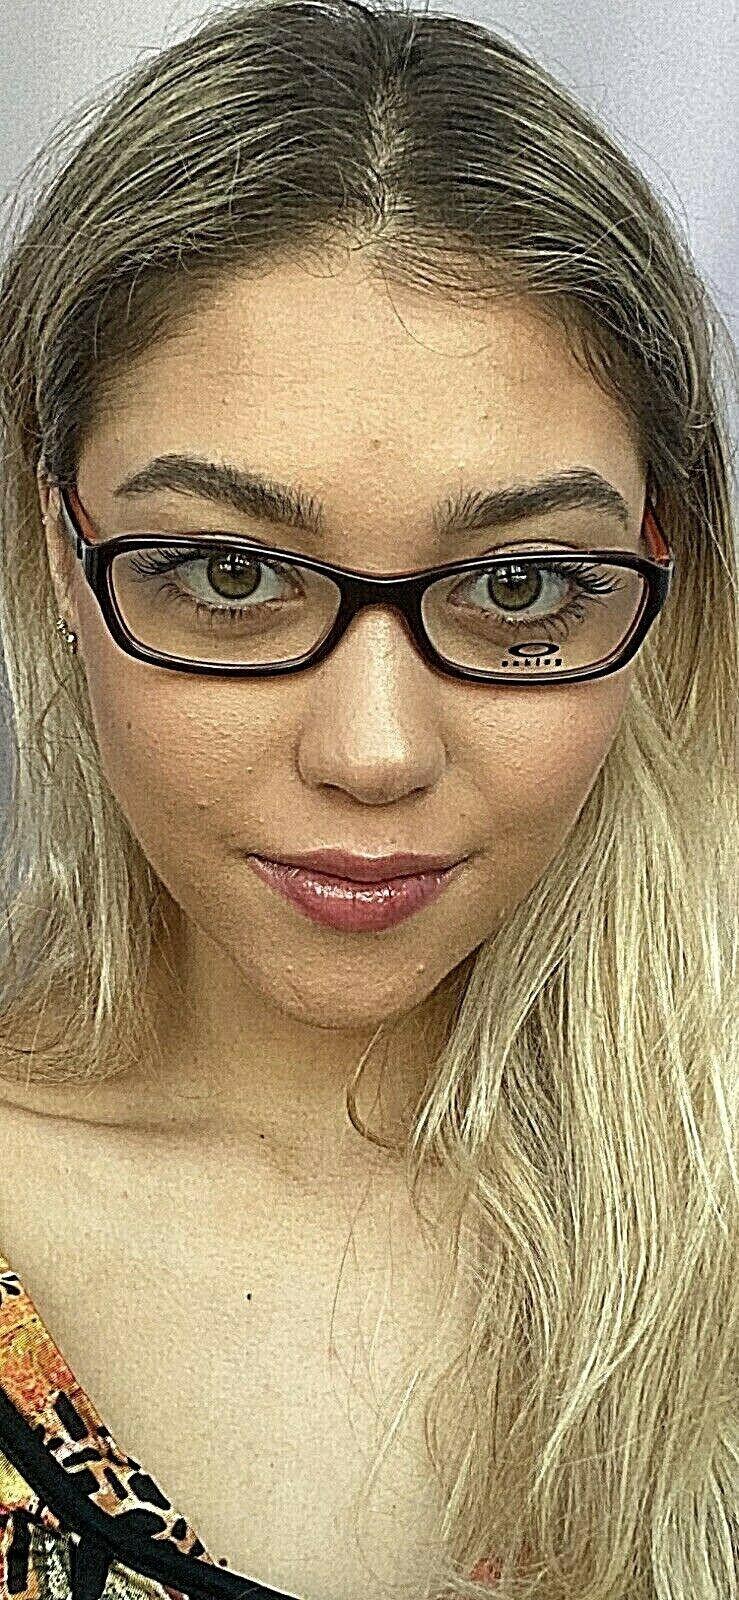 New OAKLEY OX1086-0352 52mm Women's Eyeglasses Frame  - $99.99